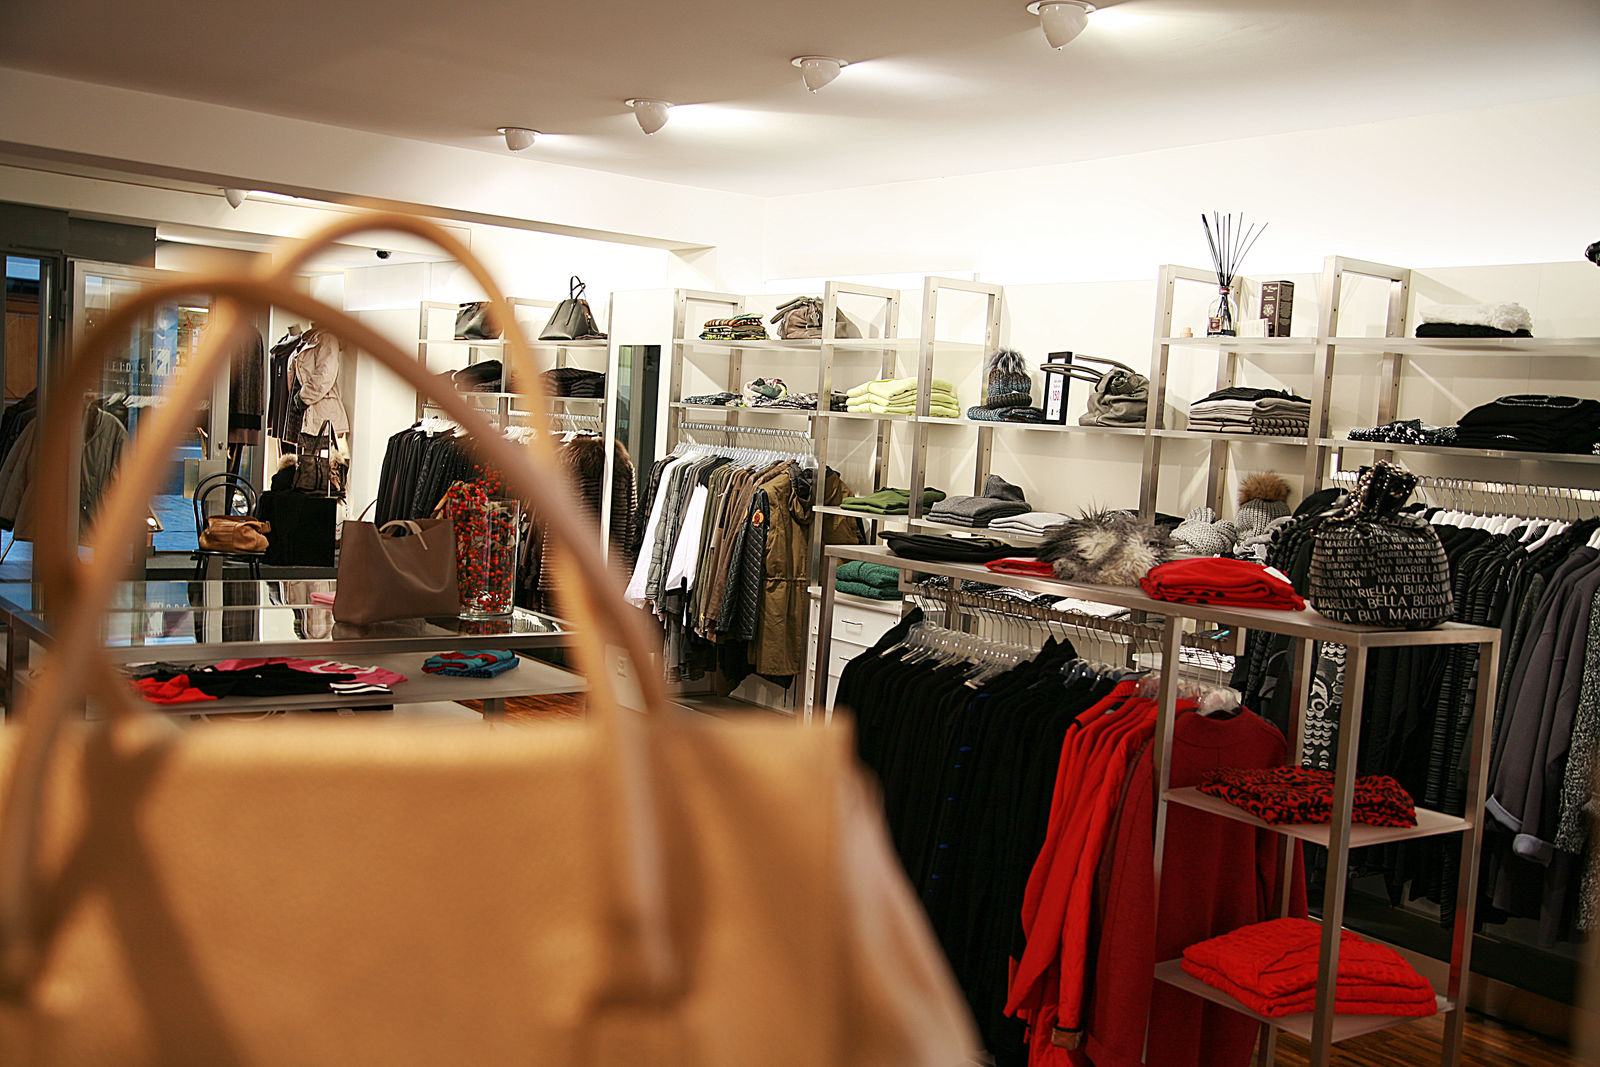 Heidis Mode - grosse Grössen in St. Gallen (Bild 7)